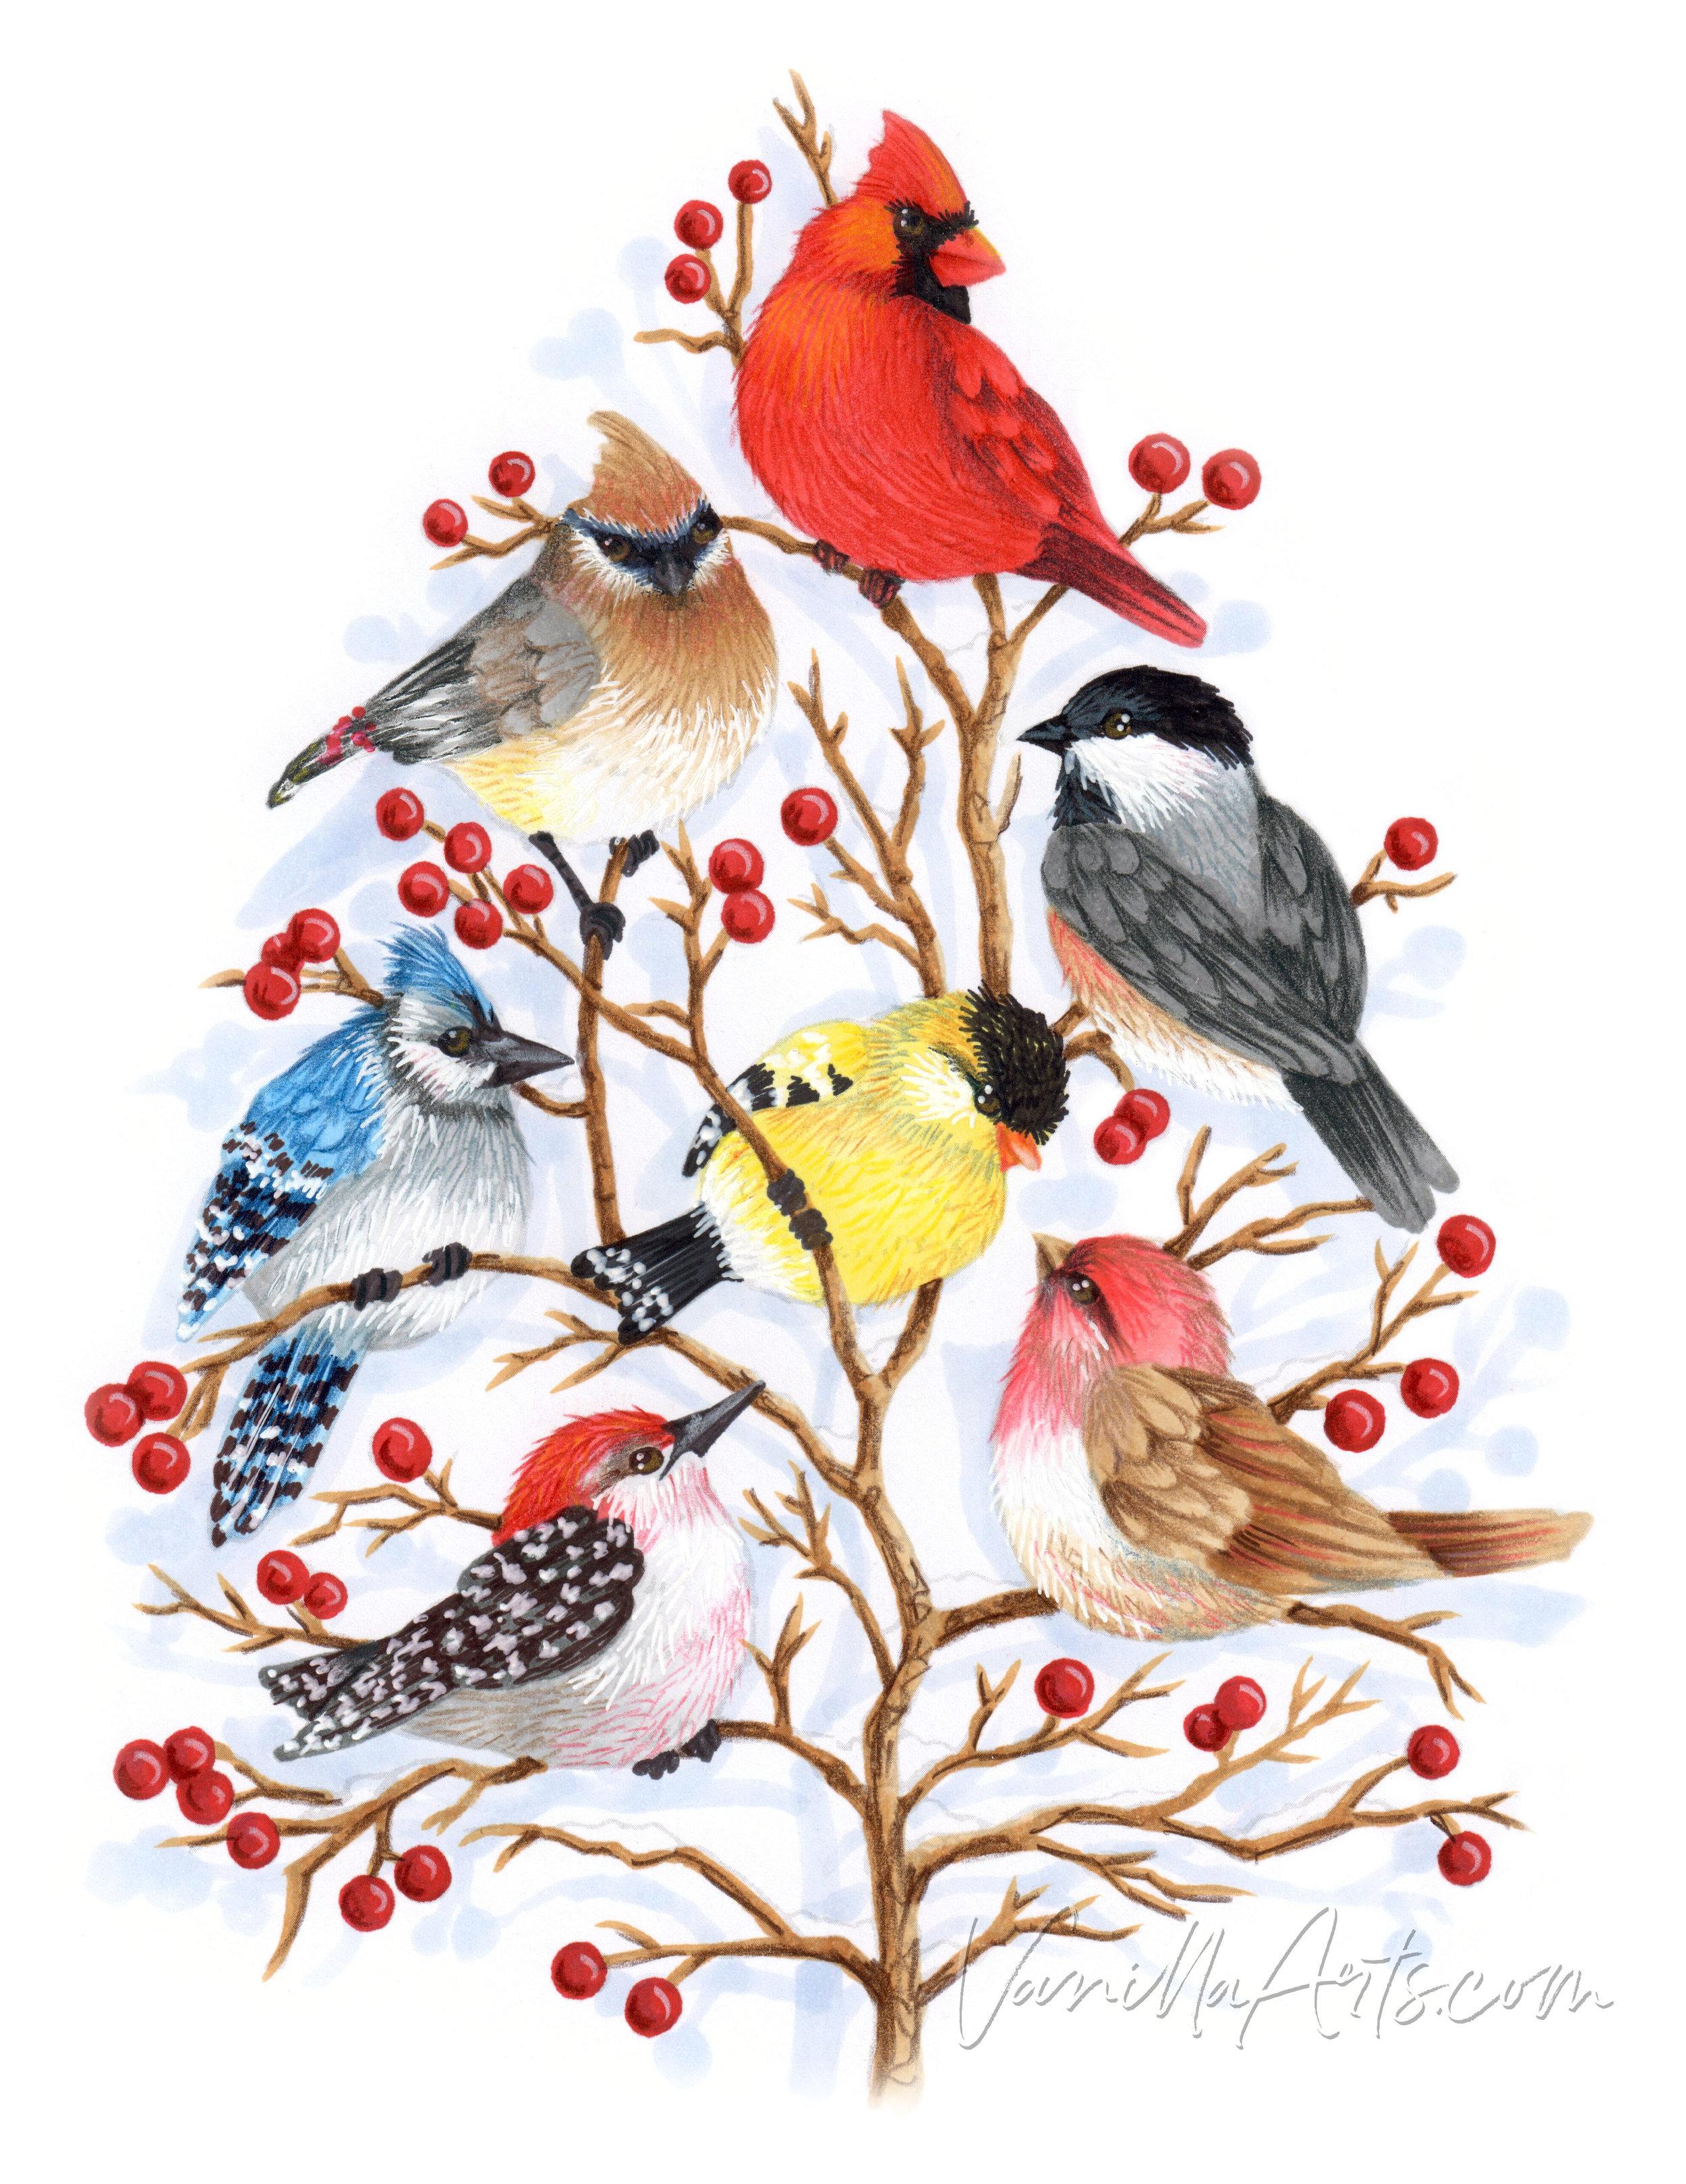 November 2018: Feathery texture for birds